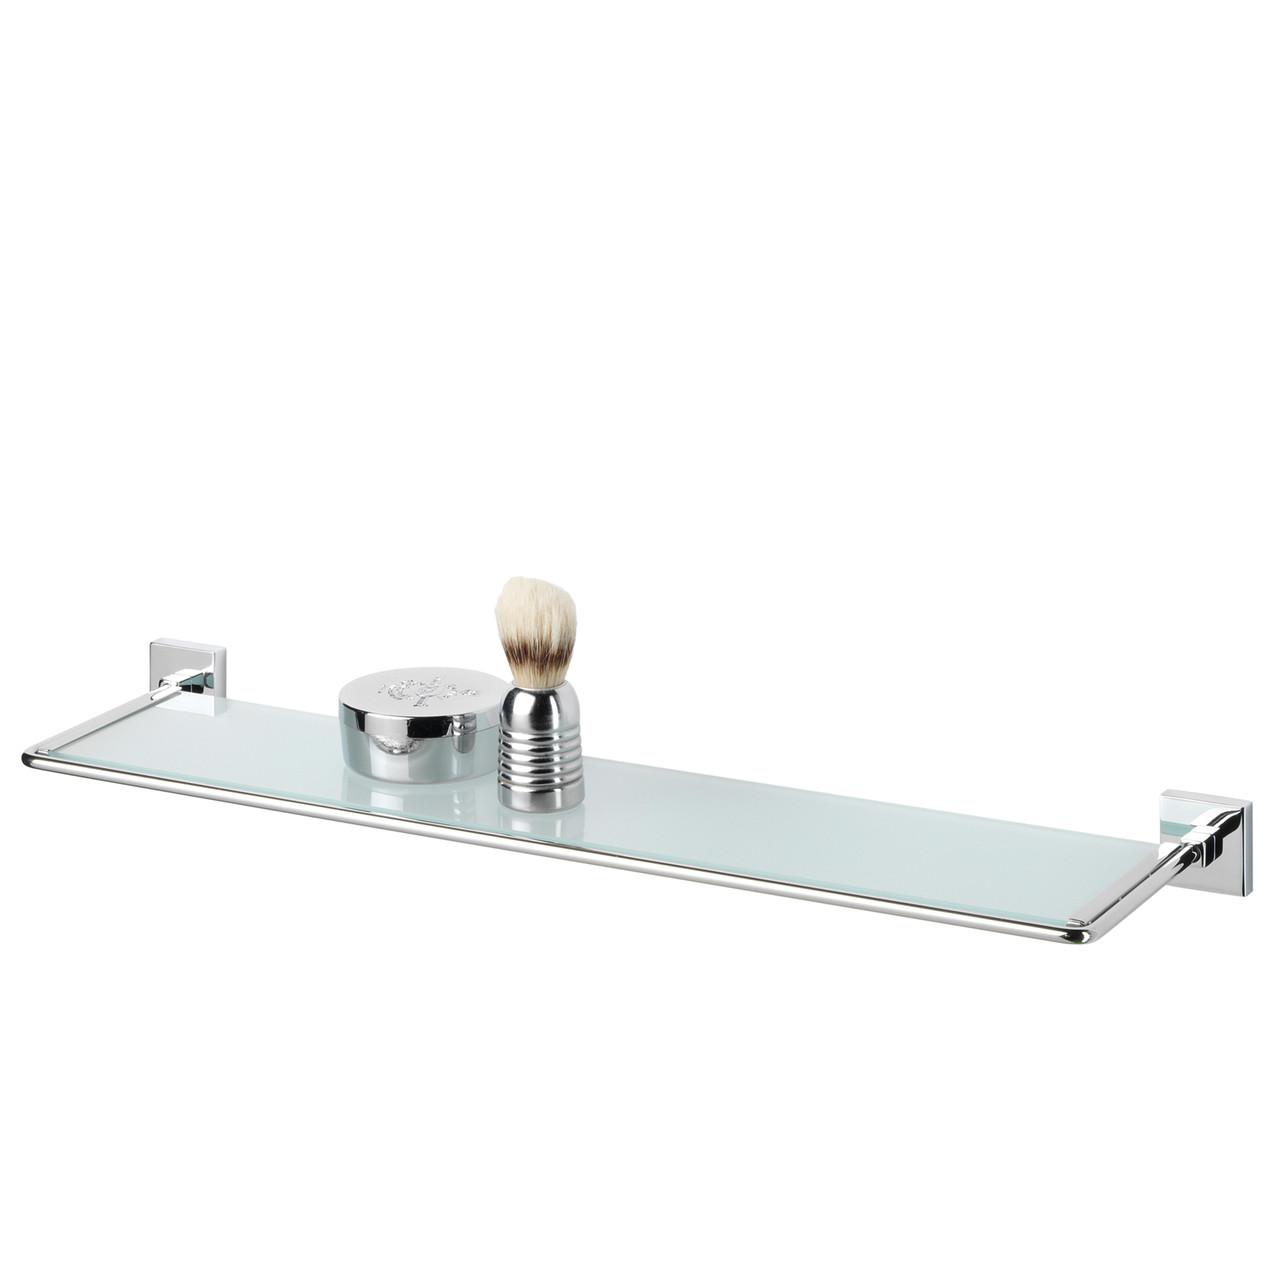 Glass Vanity Shelf Tiger Melbourne Polished Stainless Steel